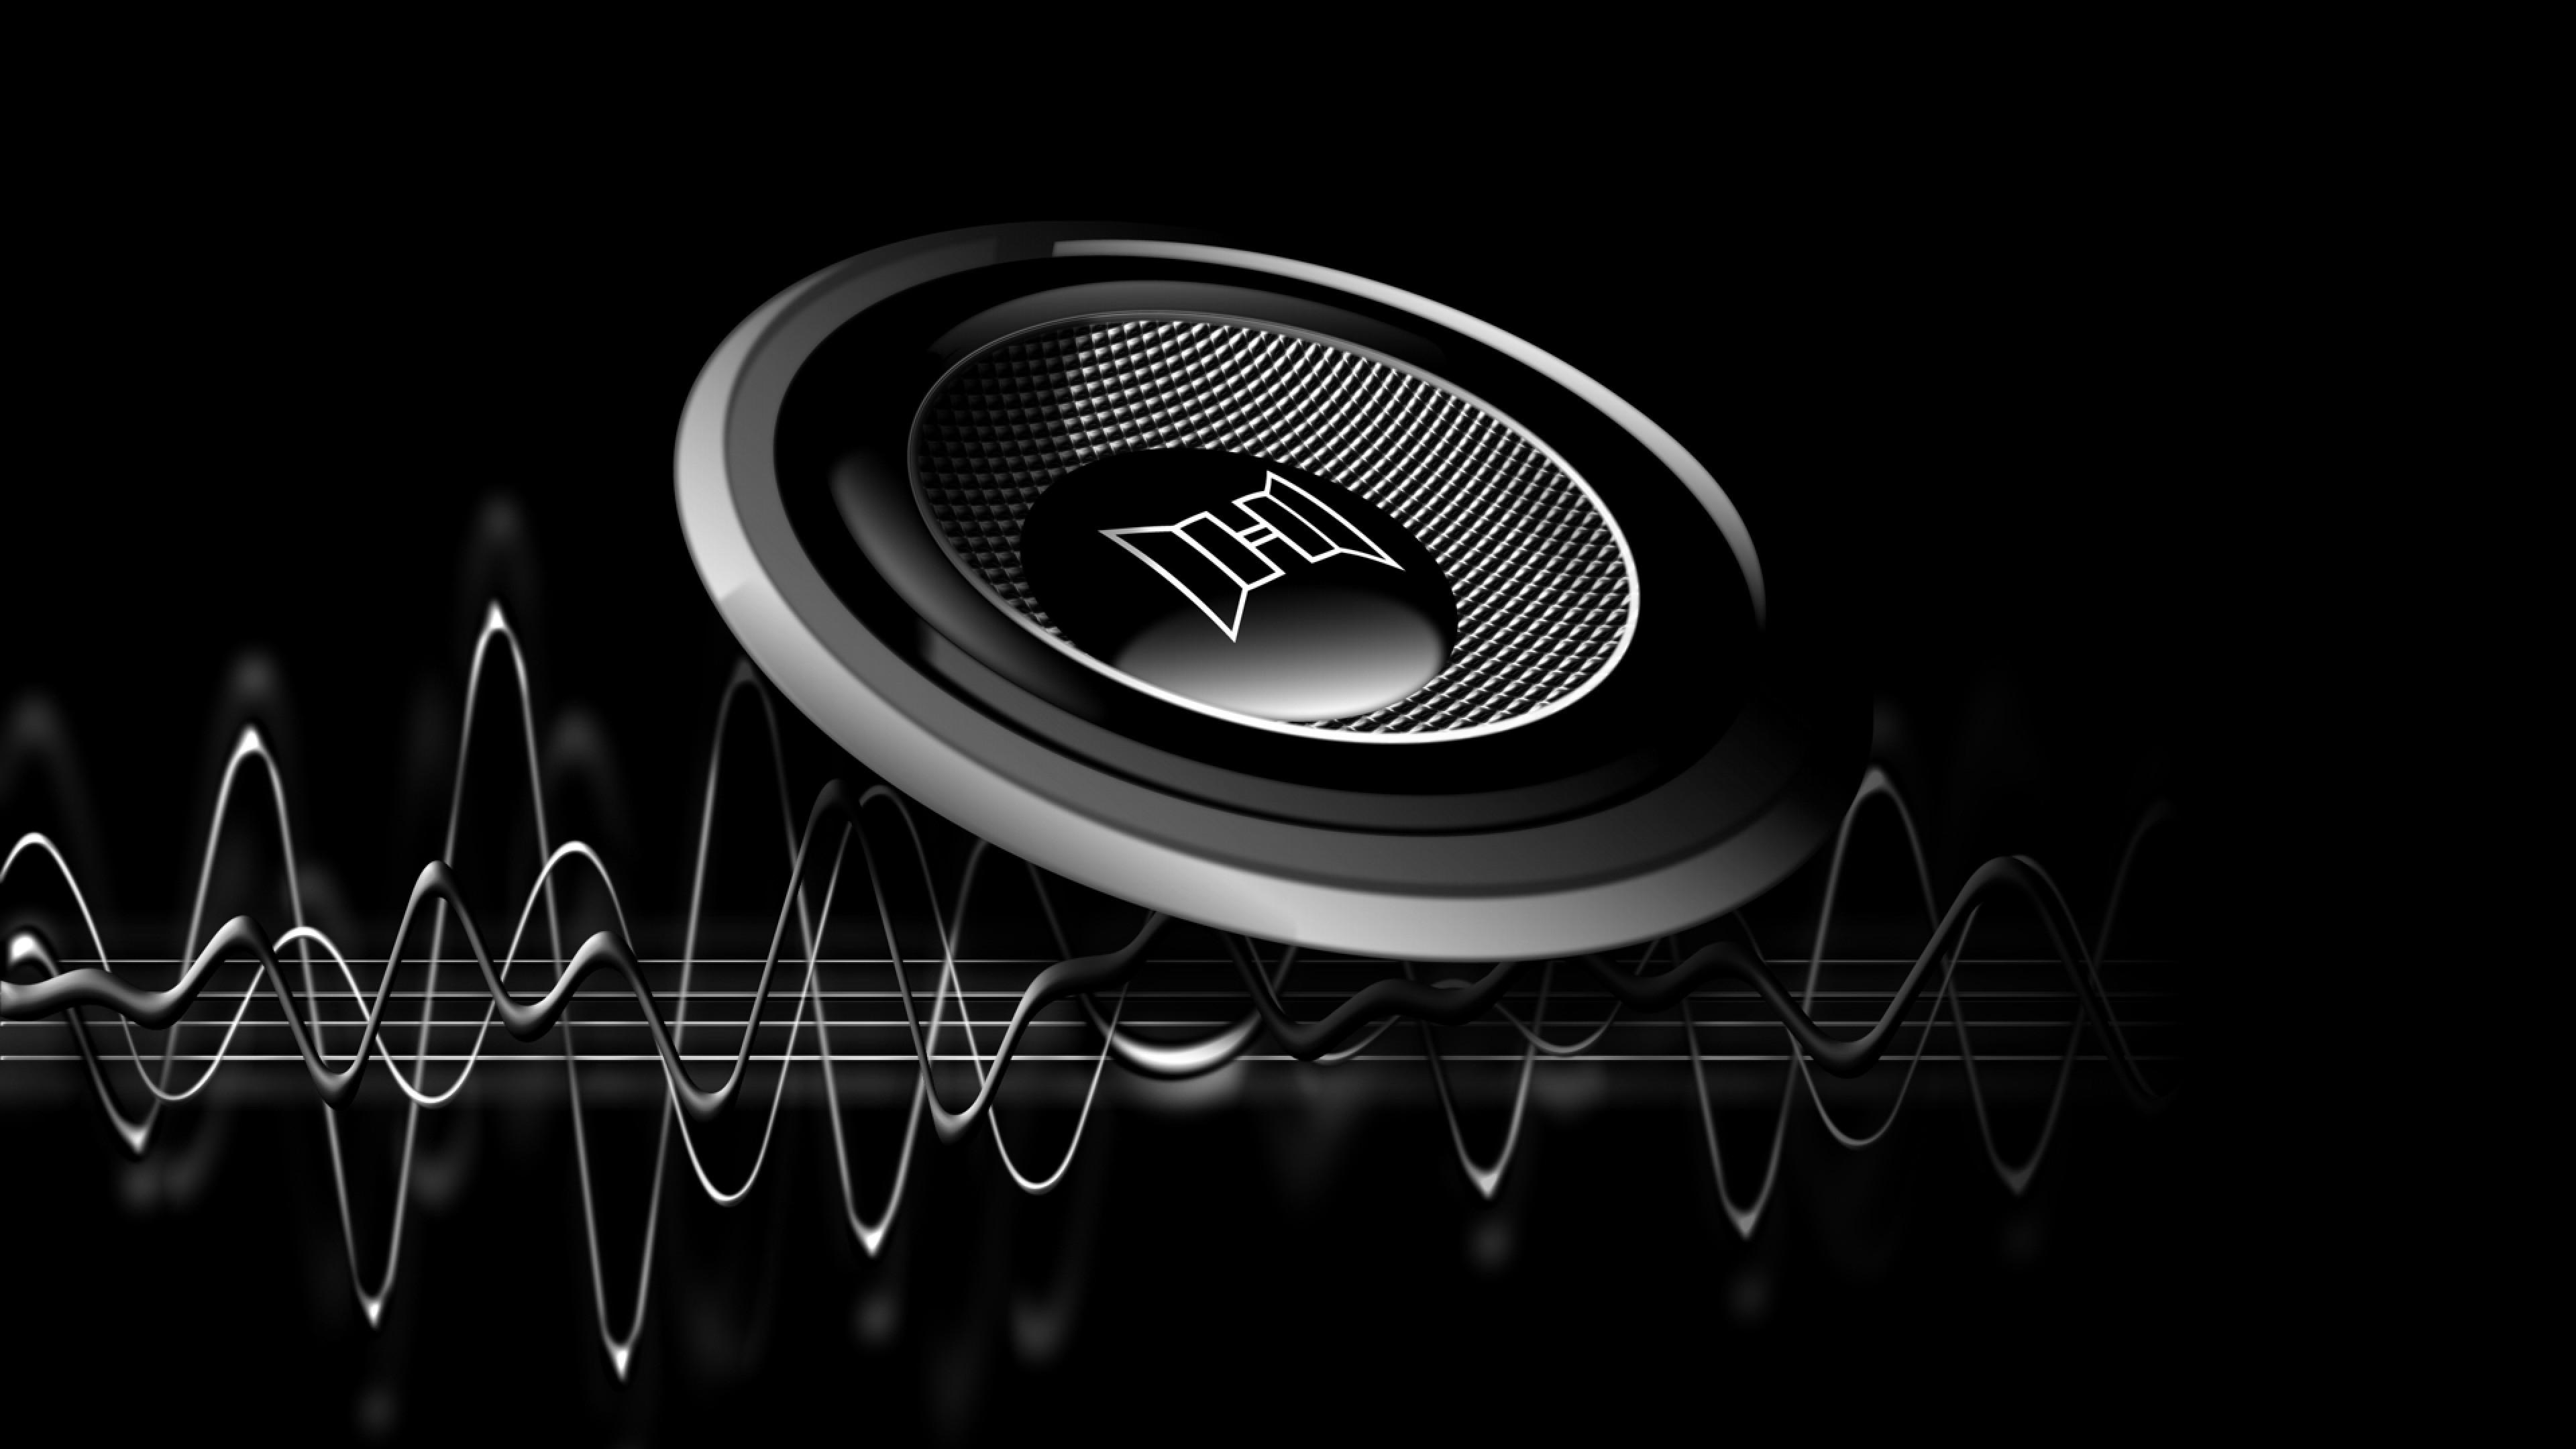 Hd Wallpaper Black Music Speaker Wallpapers Trend